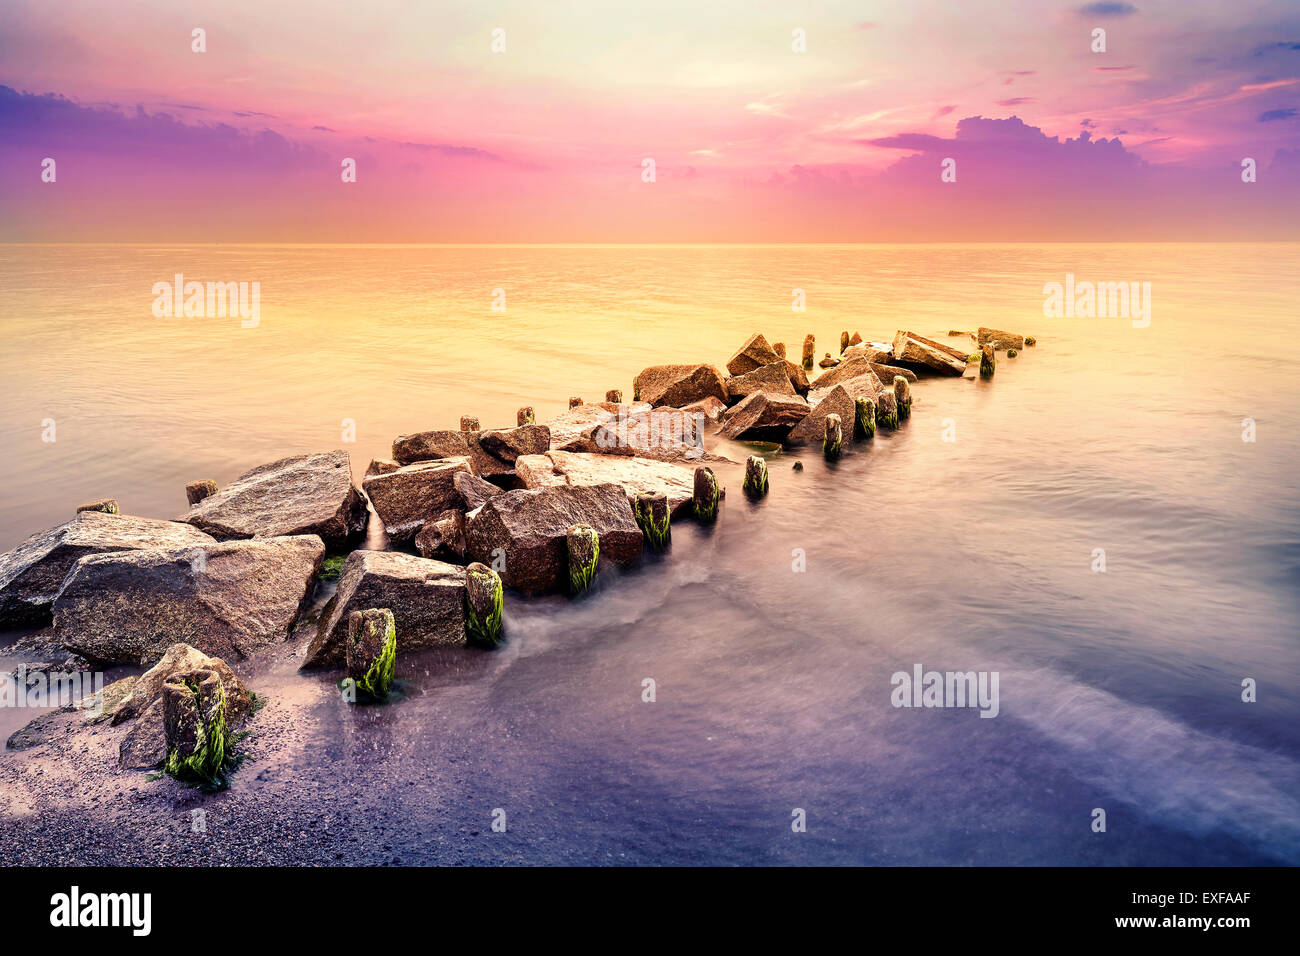 Goldene Stunde, friedlichen Meer Landschaft nach Sonnenuntergang. Stockbild